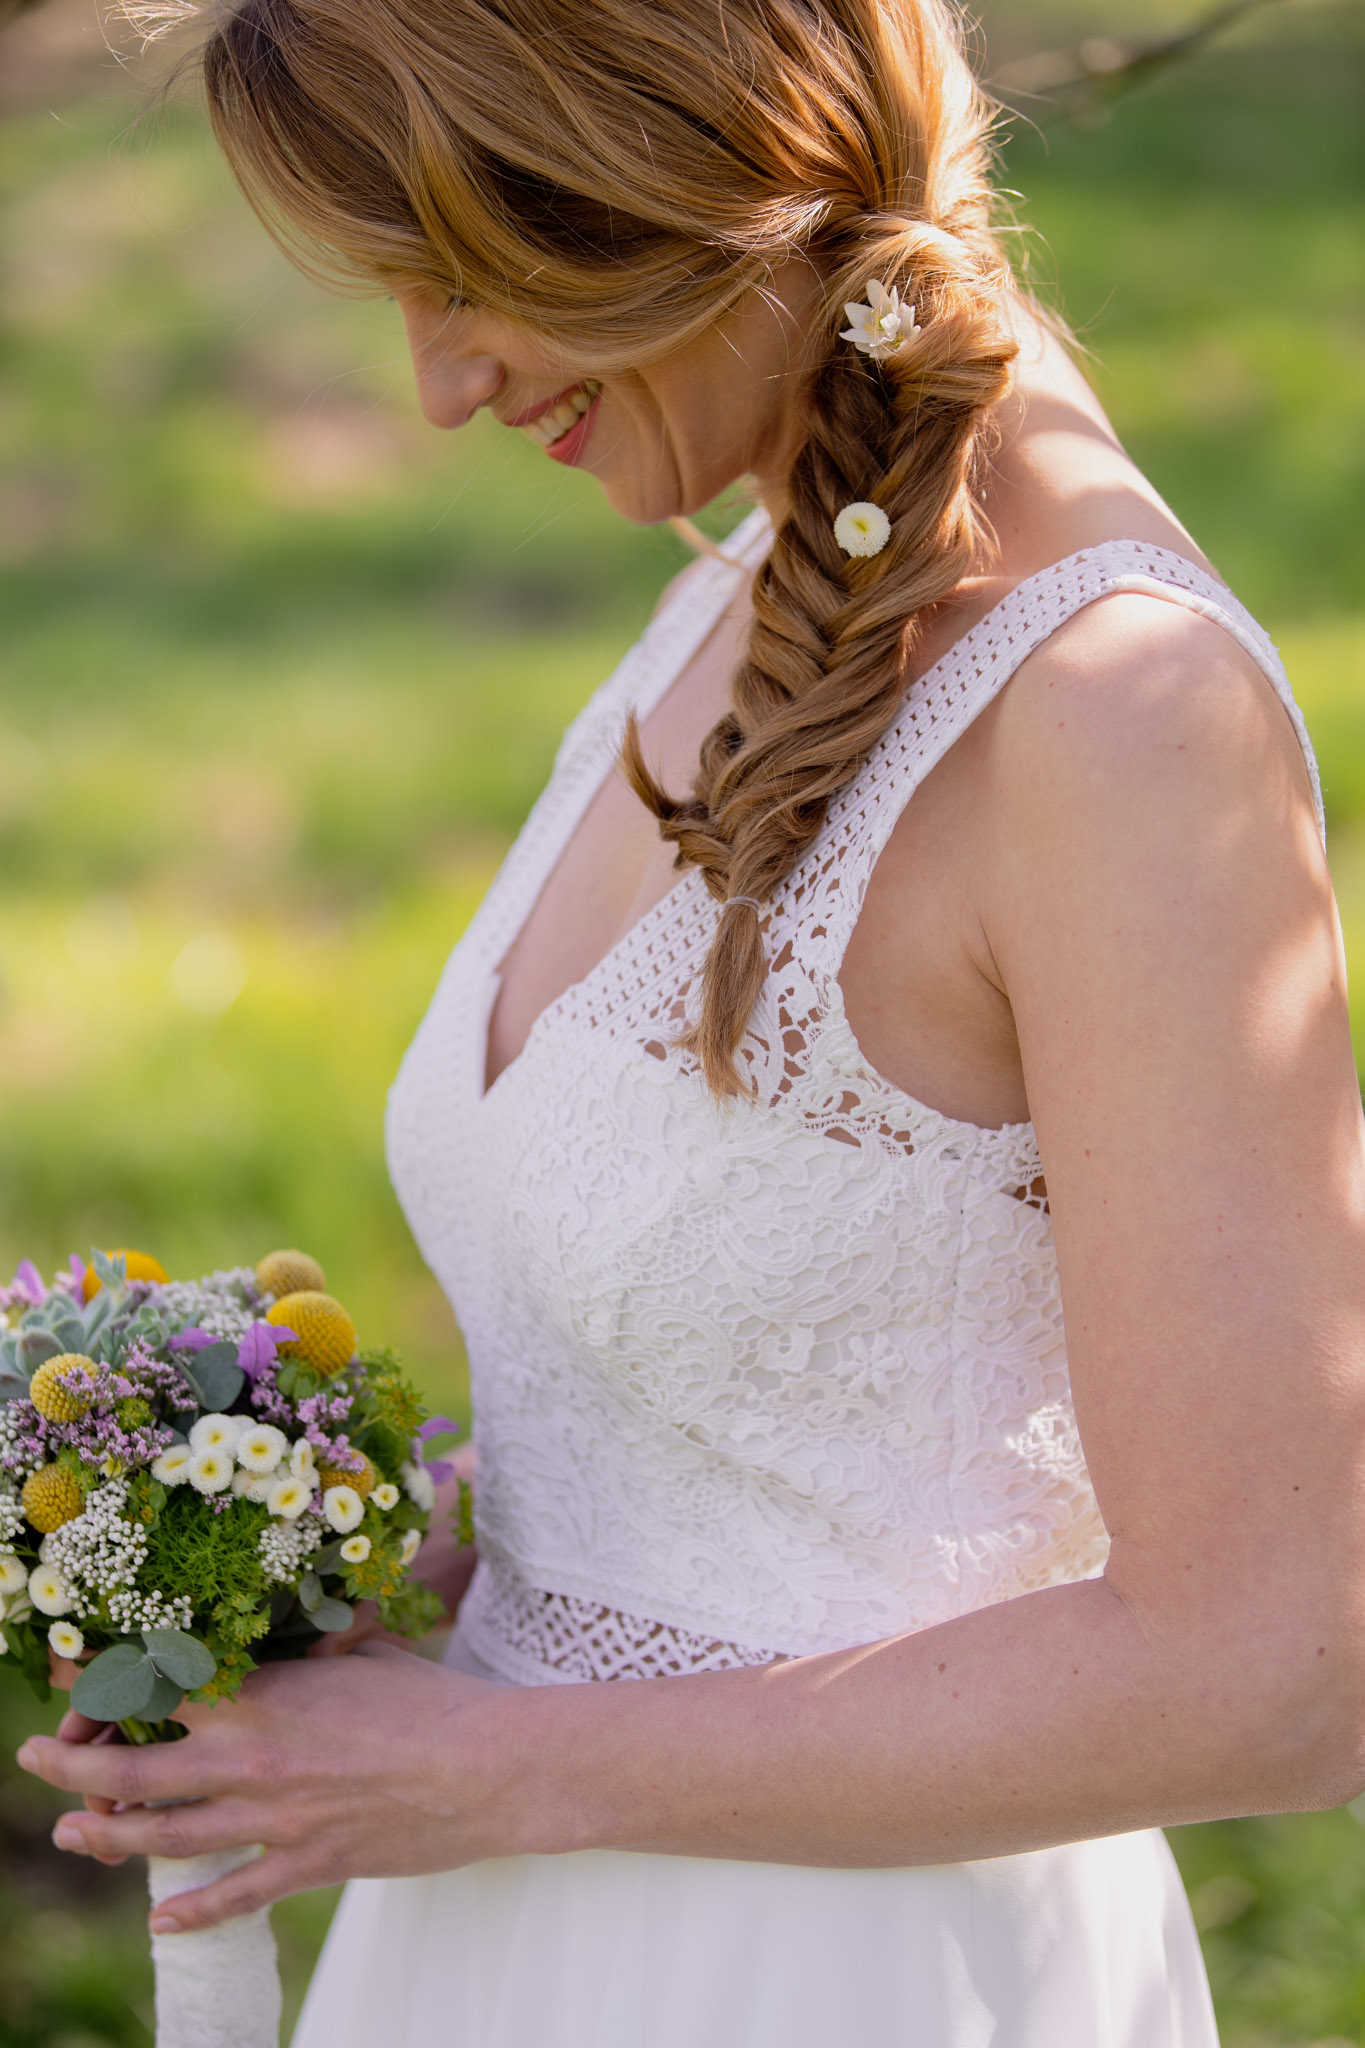 Kurzes Brautkleid im Boho-Stil mit Spitze